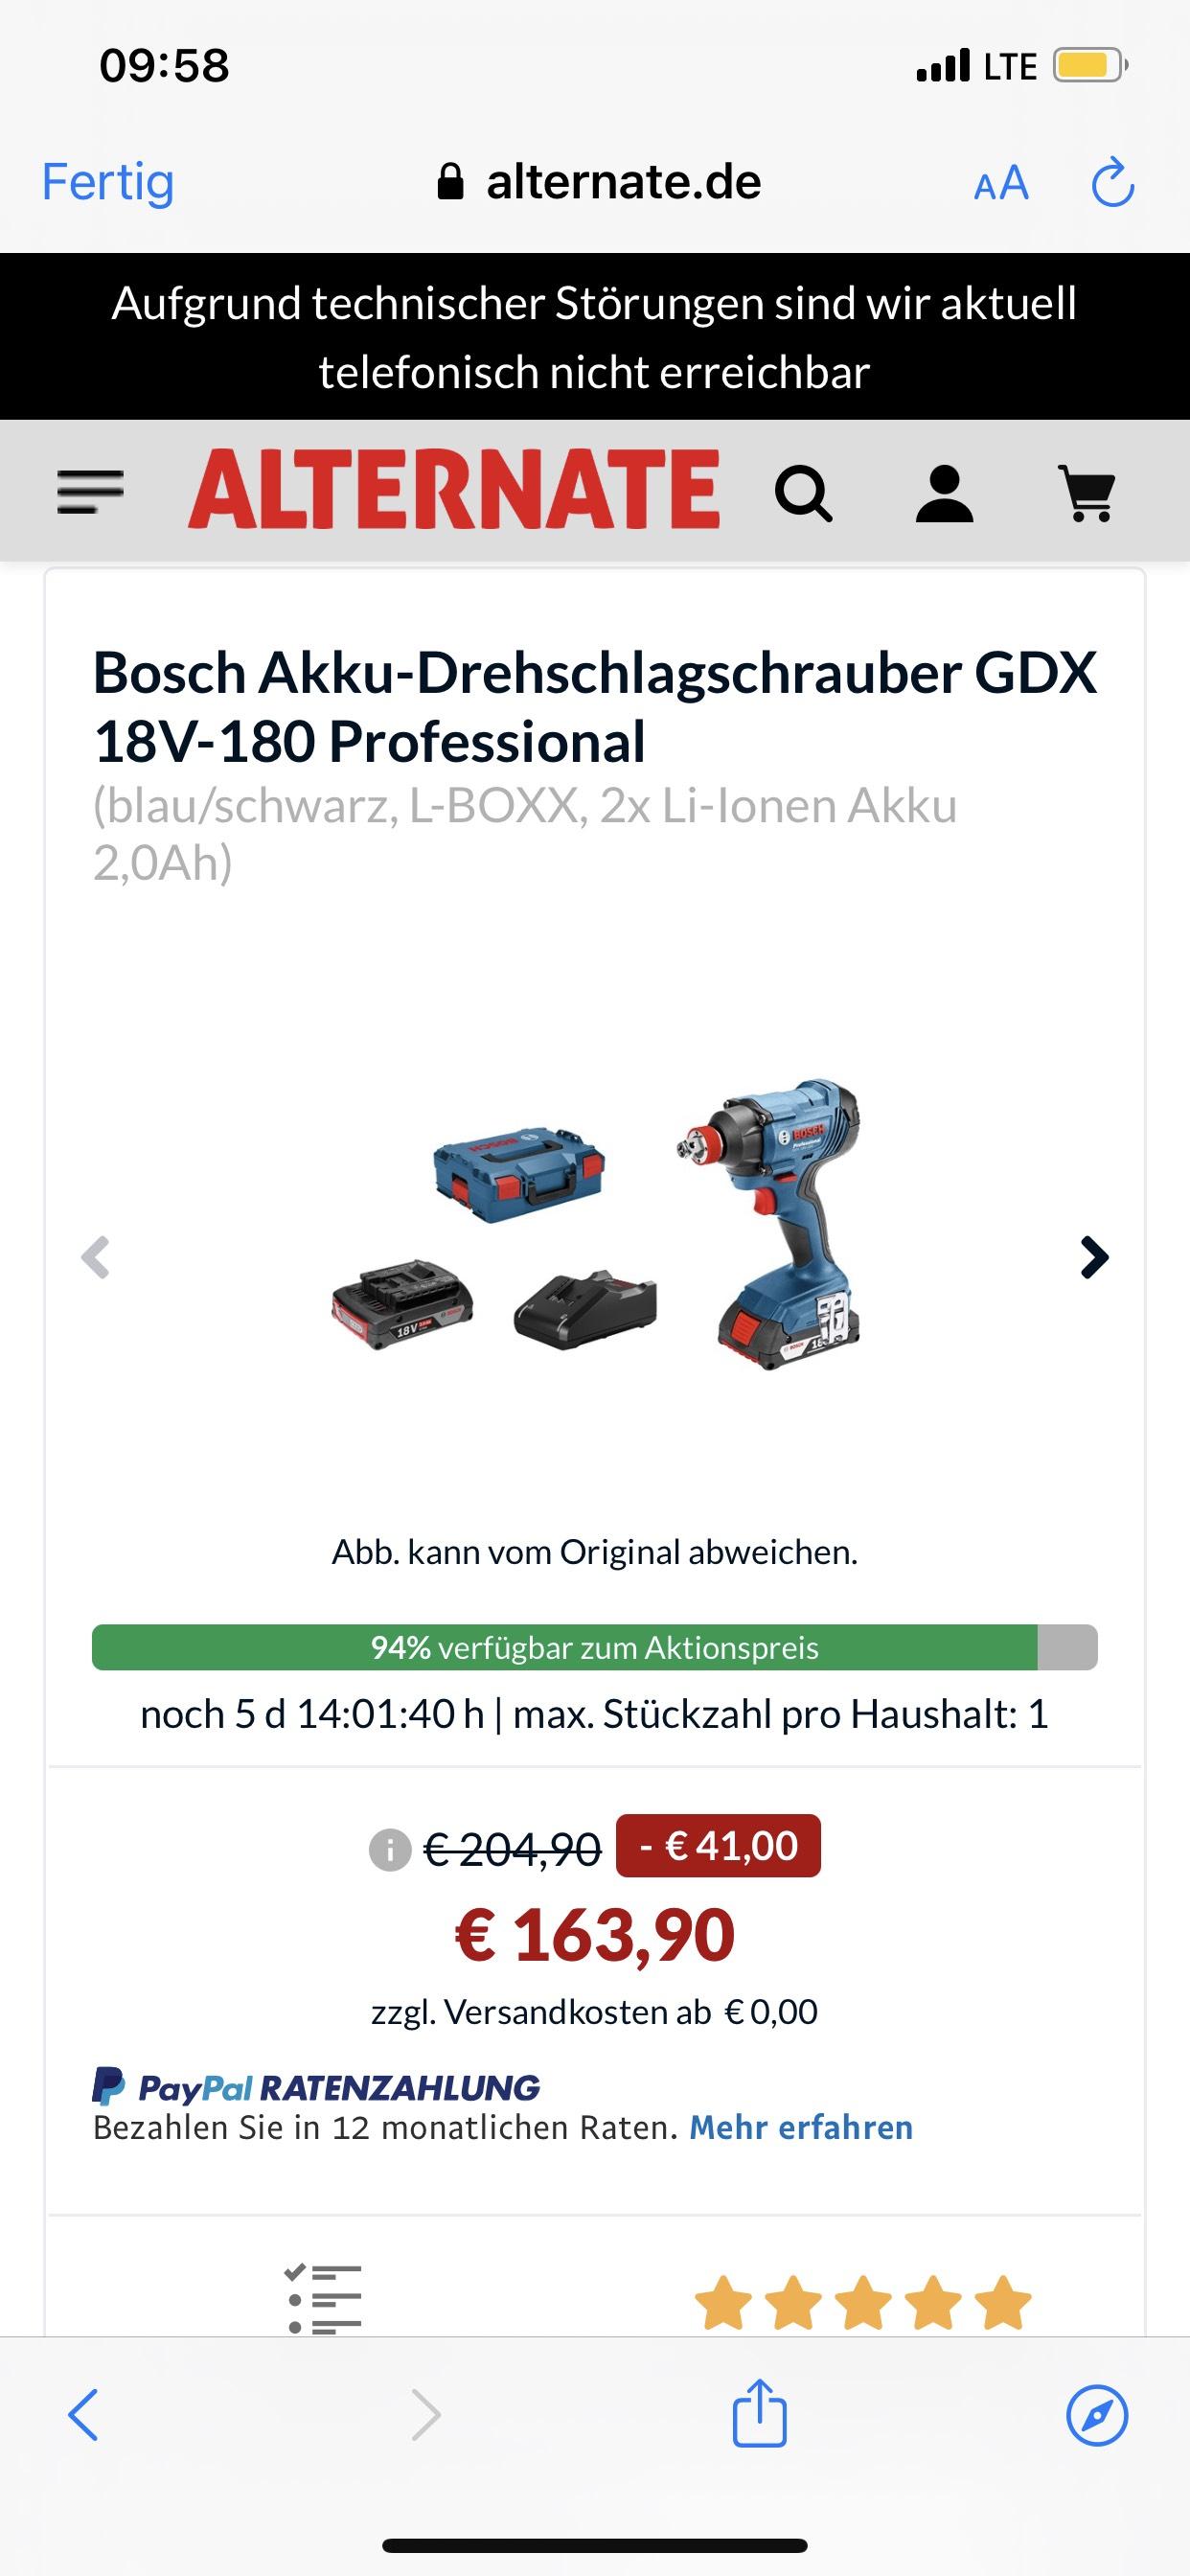 Bosch Akku-Drehschlagschrauber GDX 18V-180 Professional (blau/schwarz, L-BOXX, 2x Li-Ionen Akku 2,0Ah)